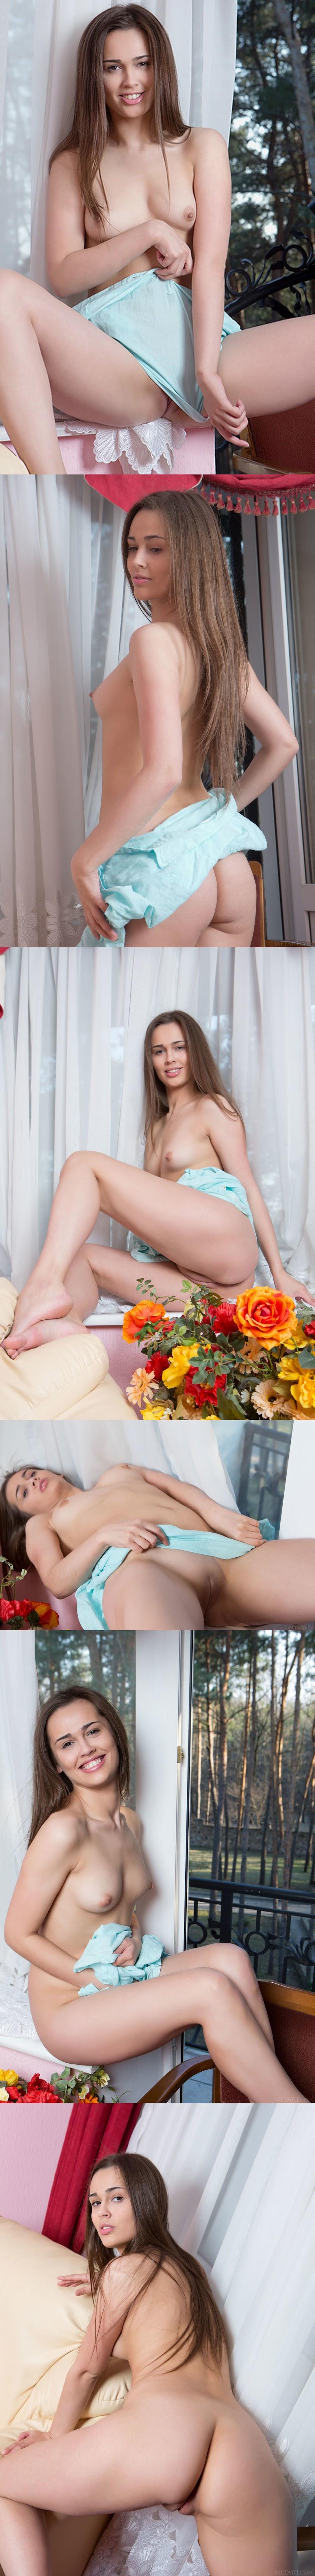 met-art  - 2014-02-02 trista a - tamora  x122  2912x4368